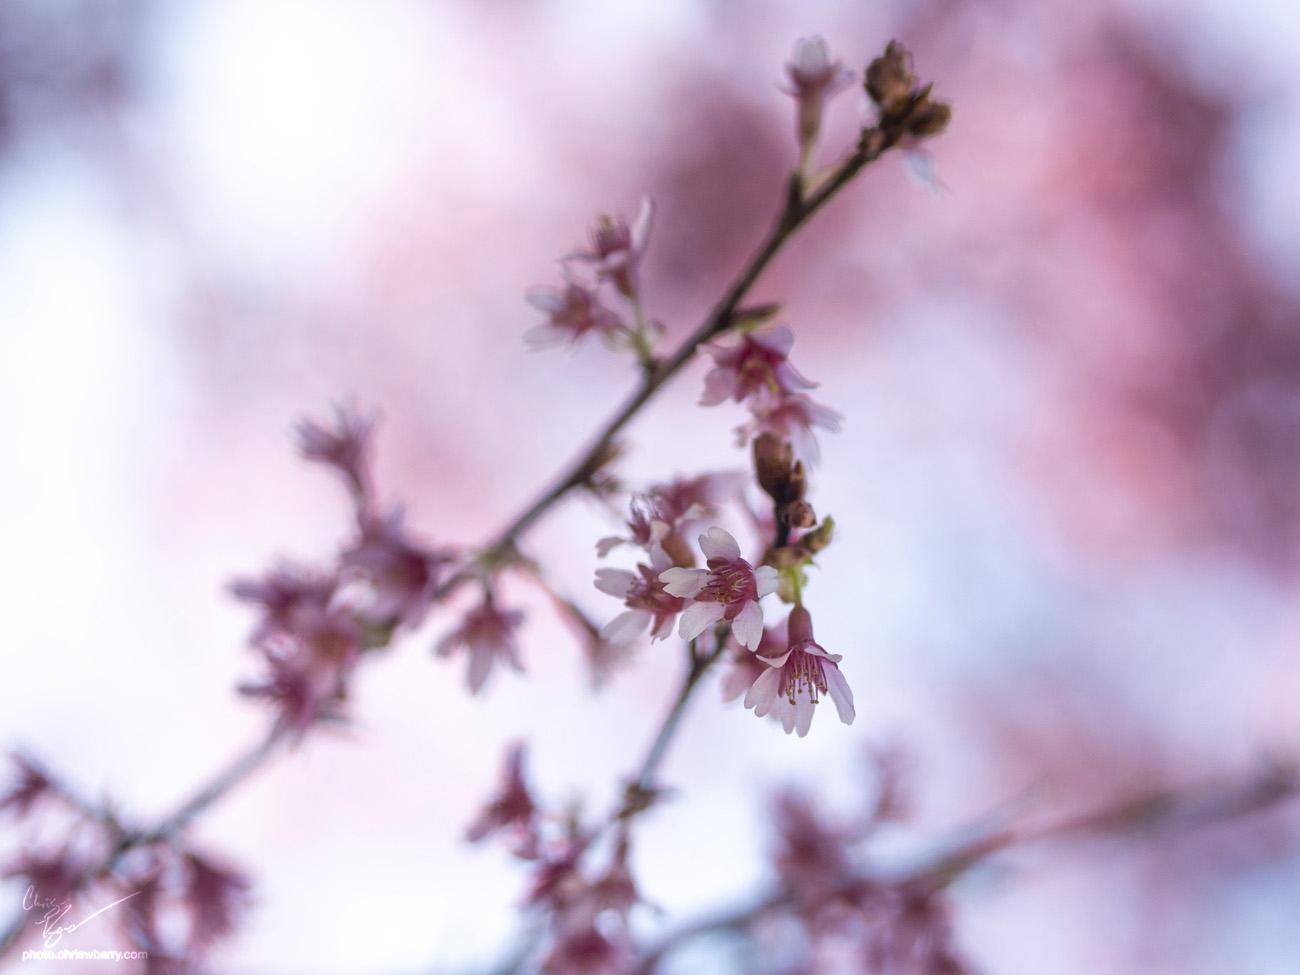 4-21-18: Cherry Blossoms?